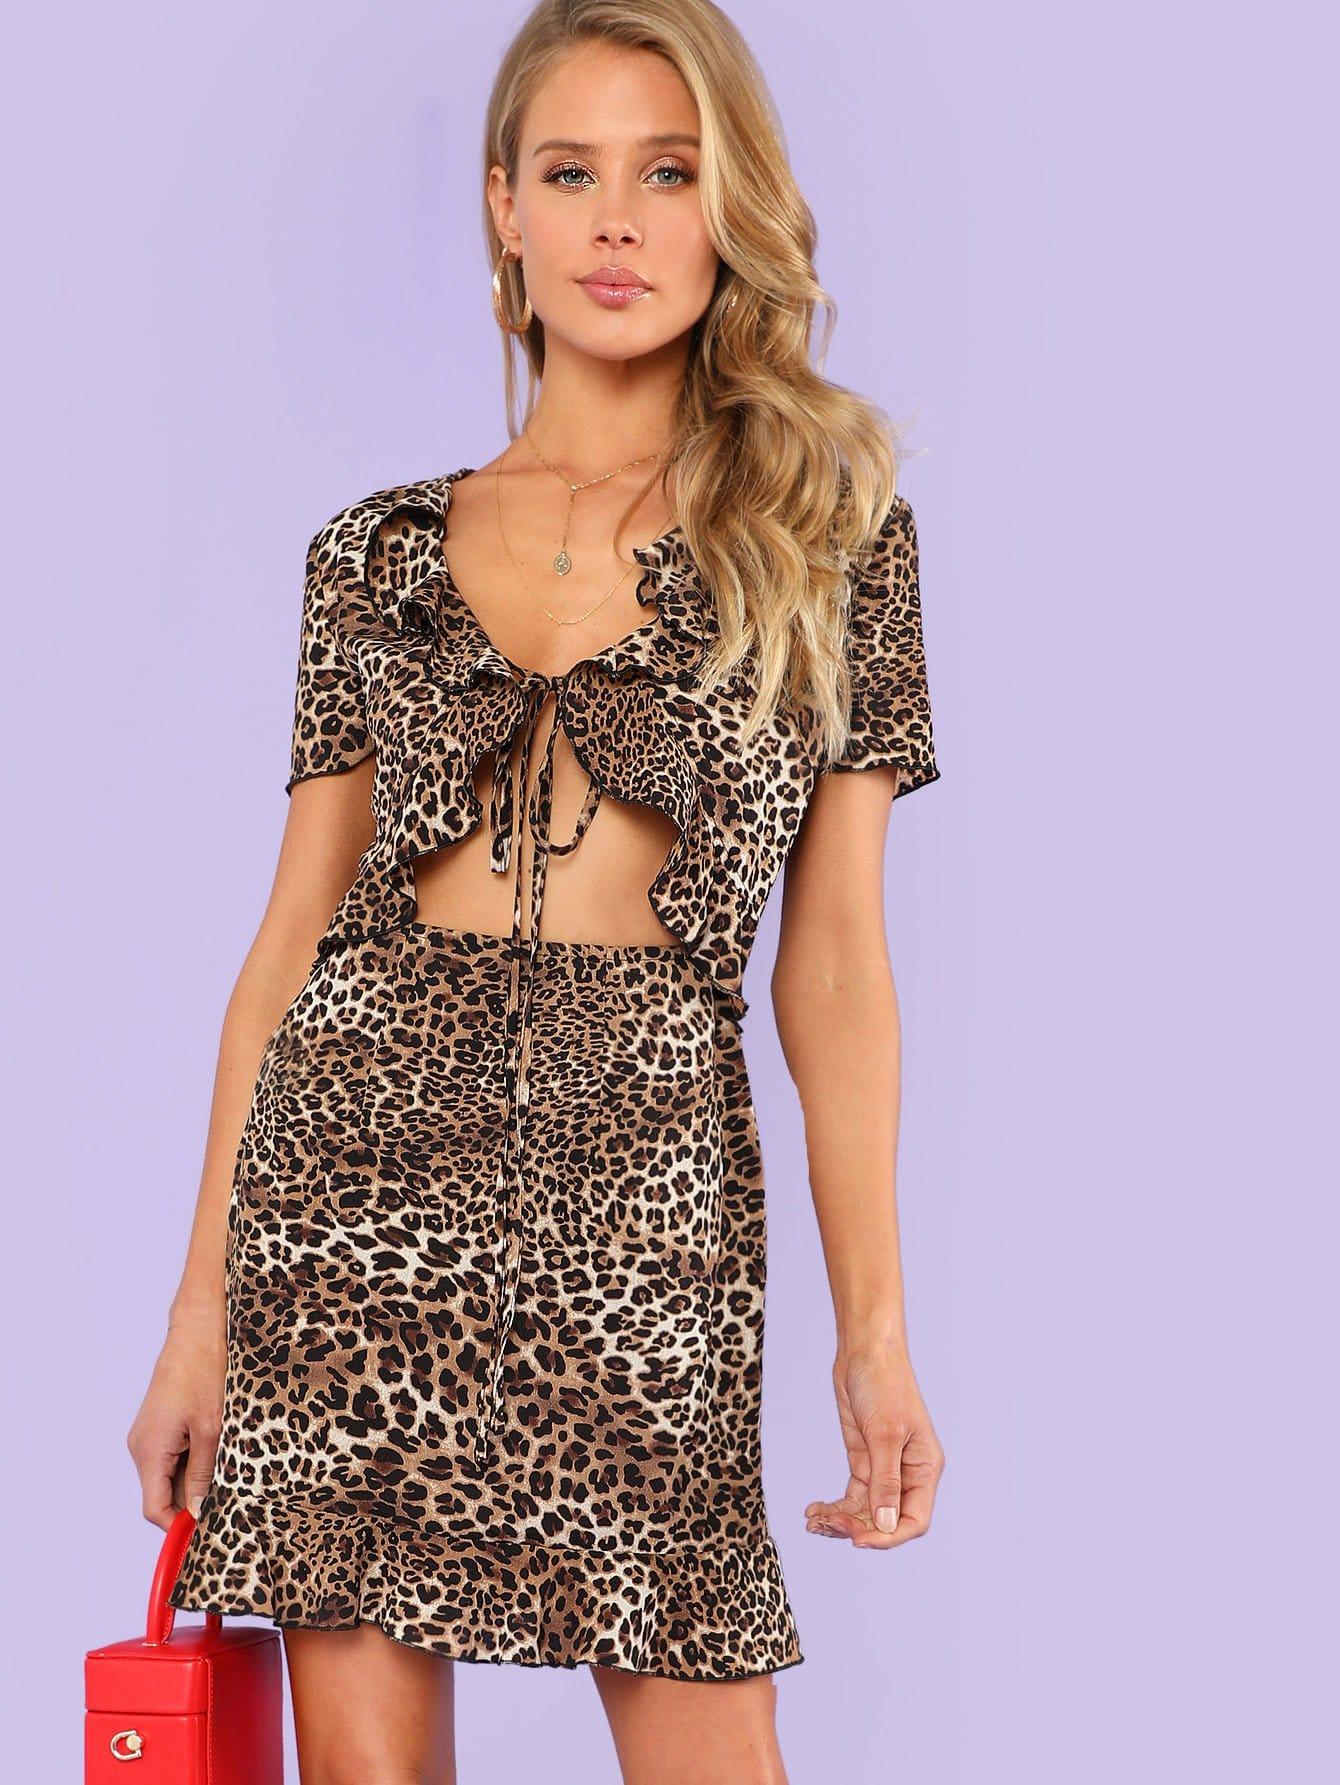 Knotted Open Front Ruffle Leopard Dress valentine golden brown pettiskirt dress leopard heart ruffle bow white top 1 8y mapsa0229